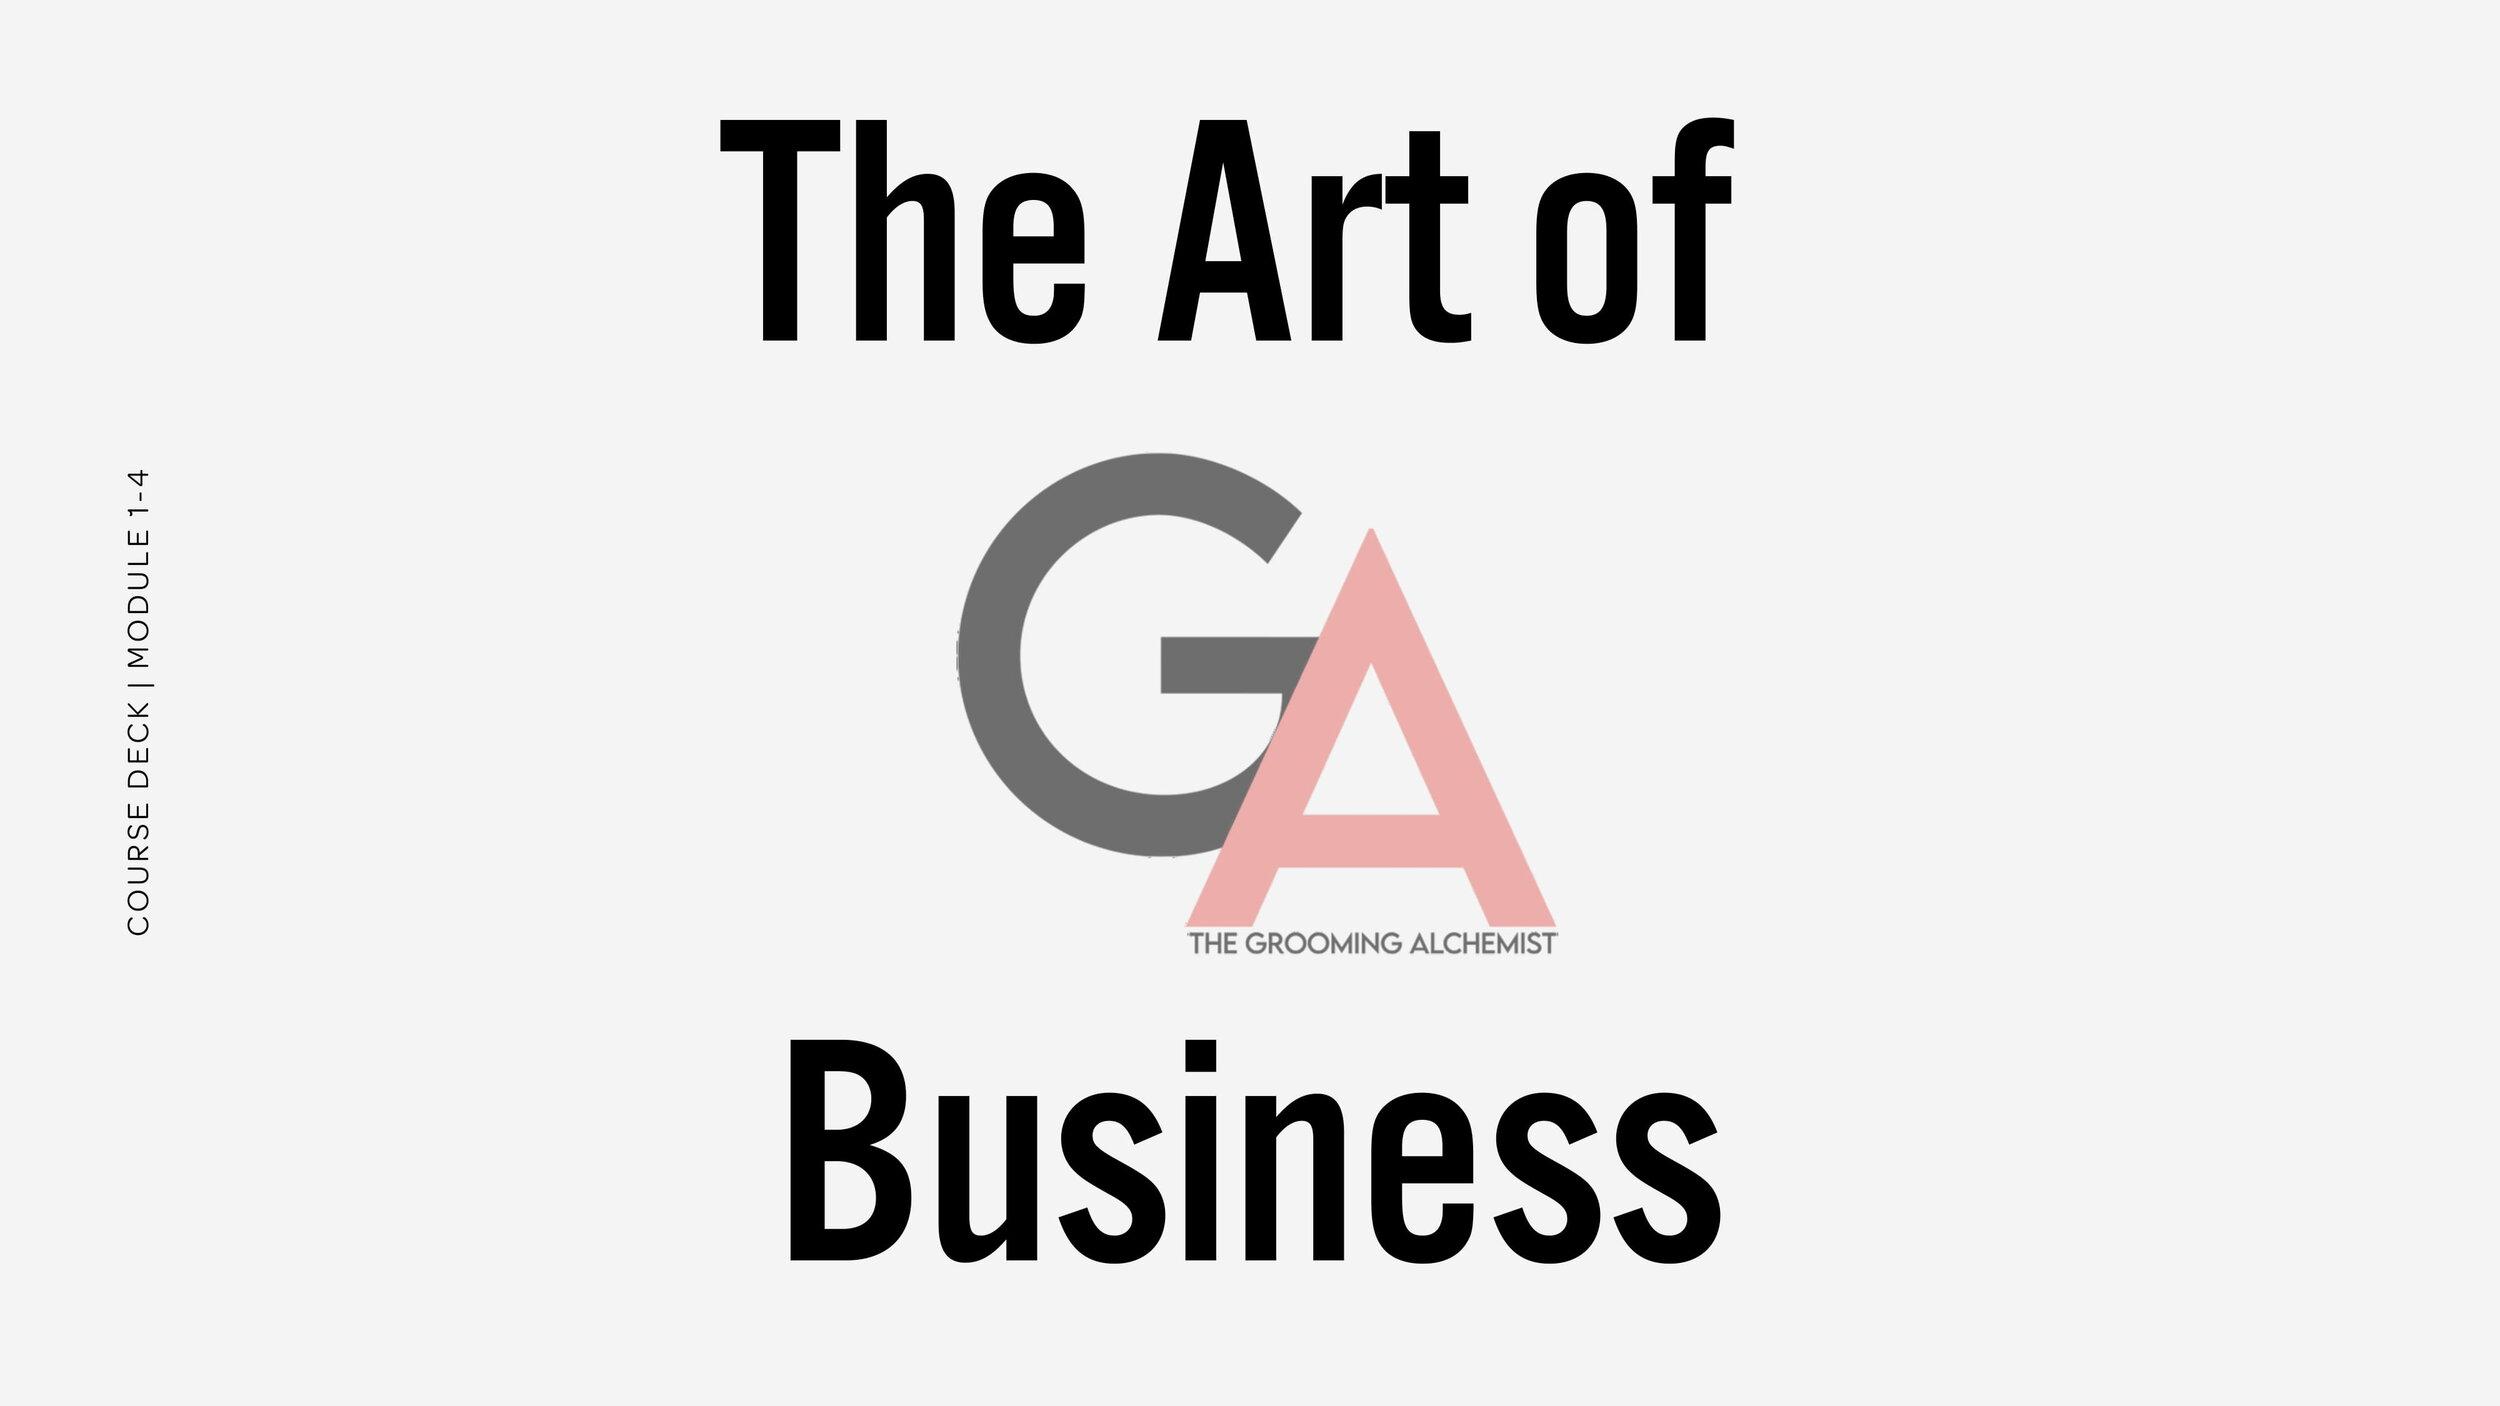 The Art of Business (1)-1.jpg